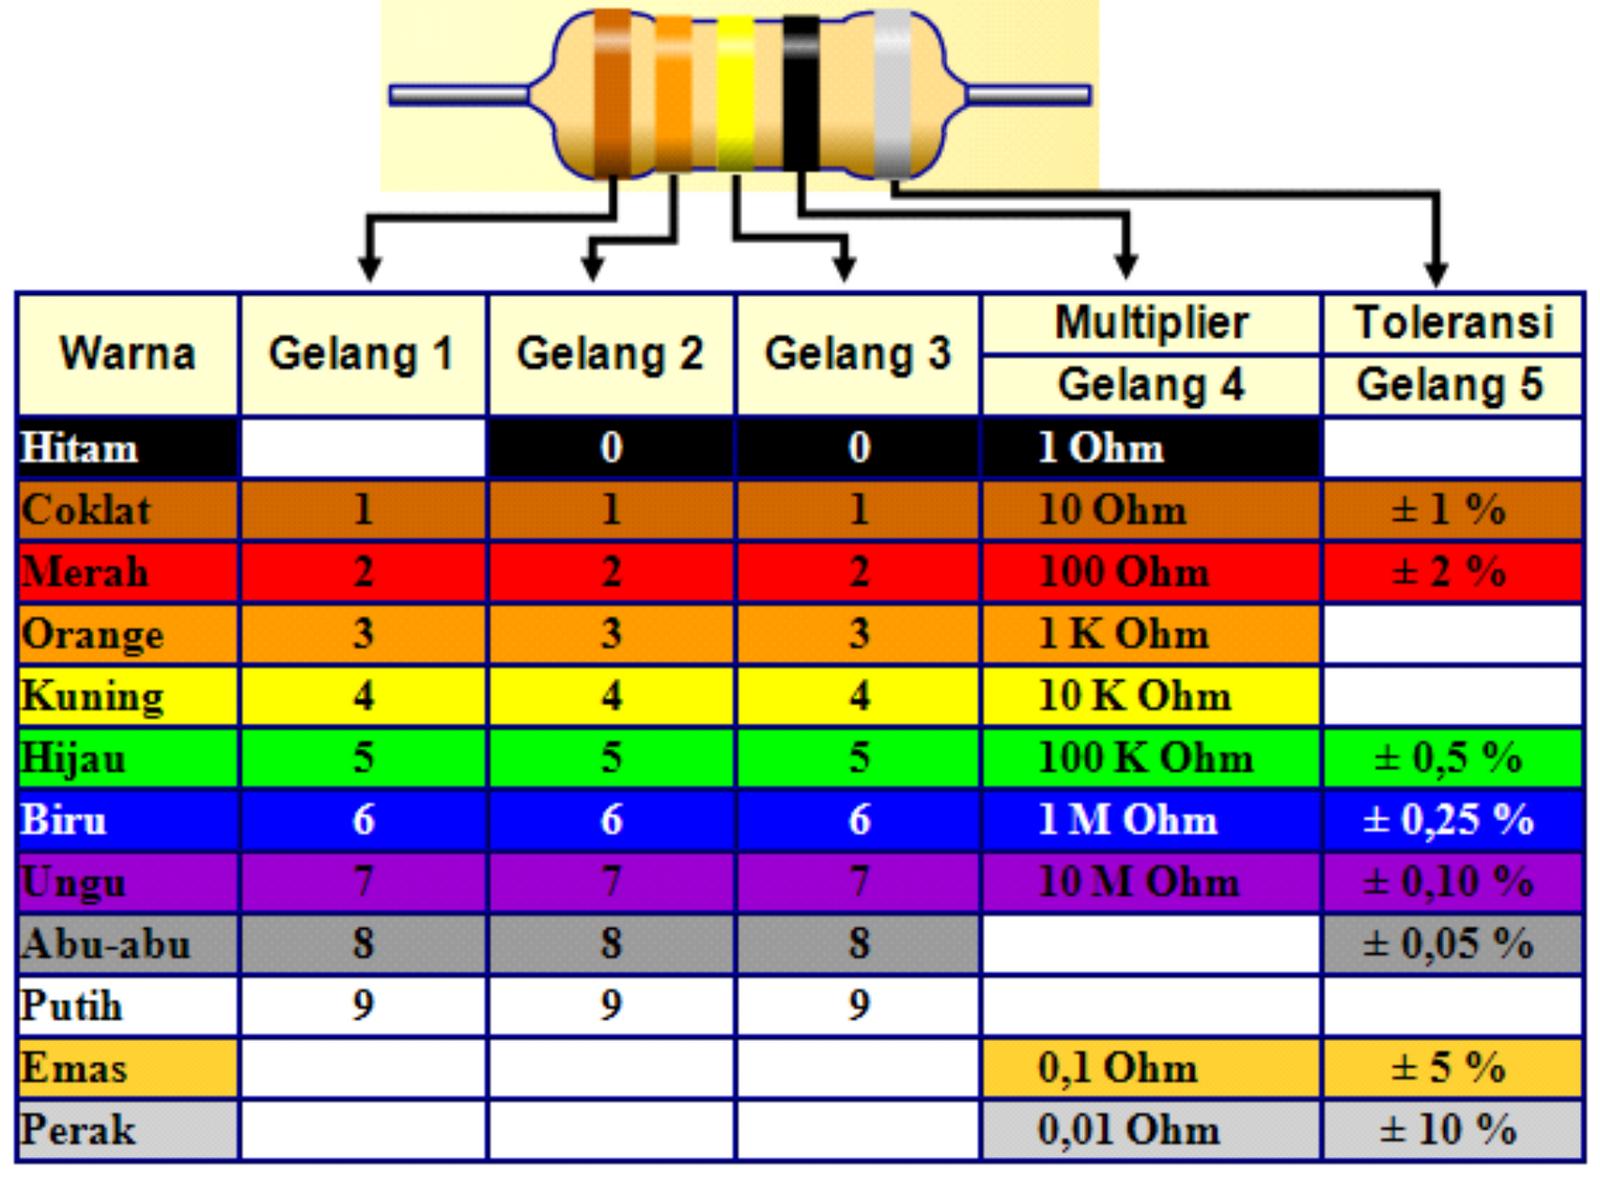 Tabel Resistor 5 warna